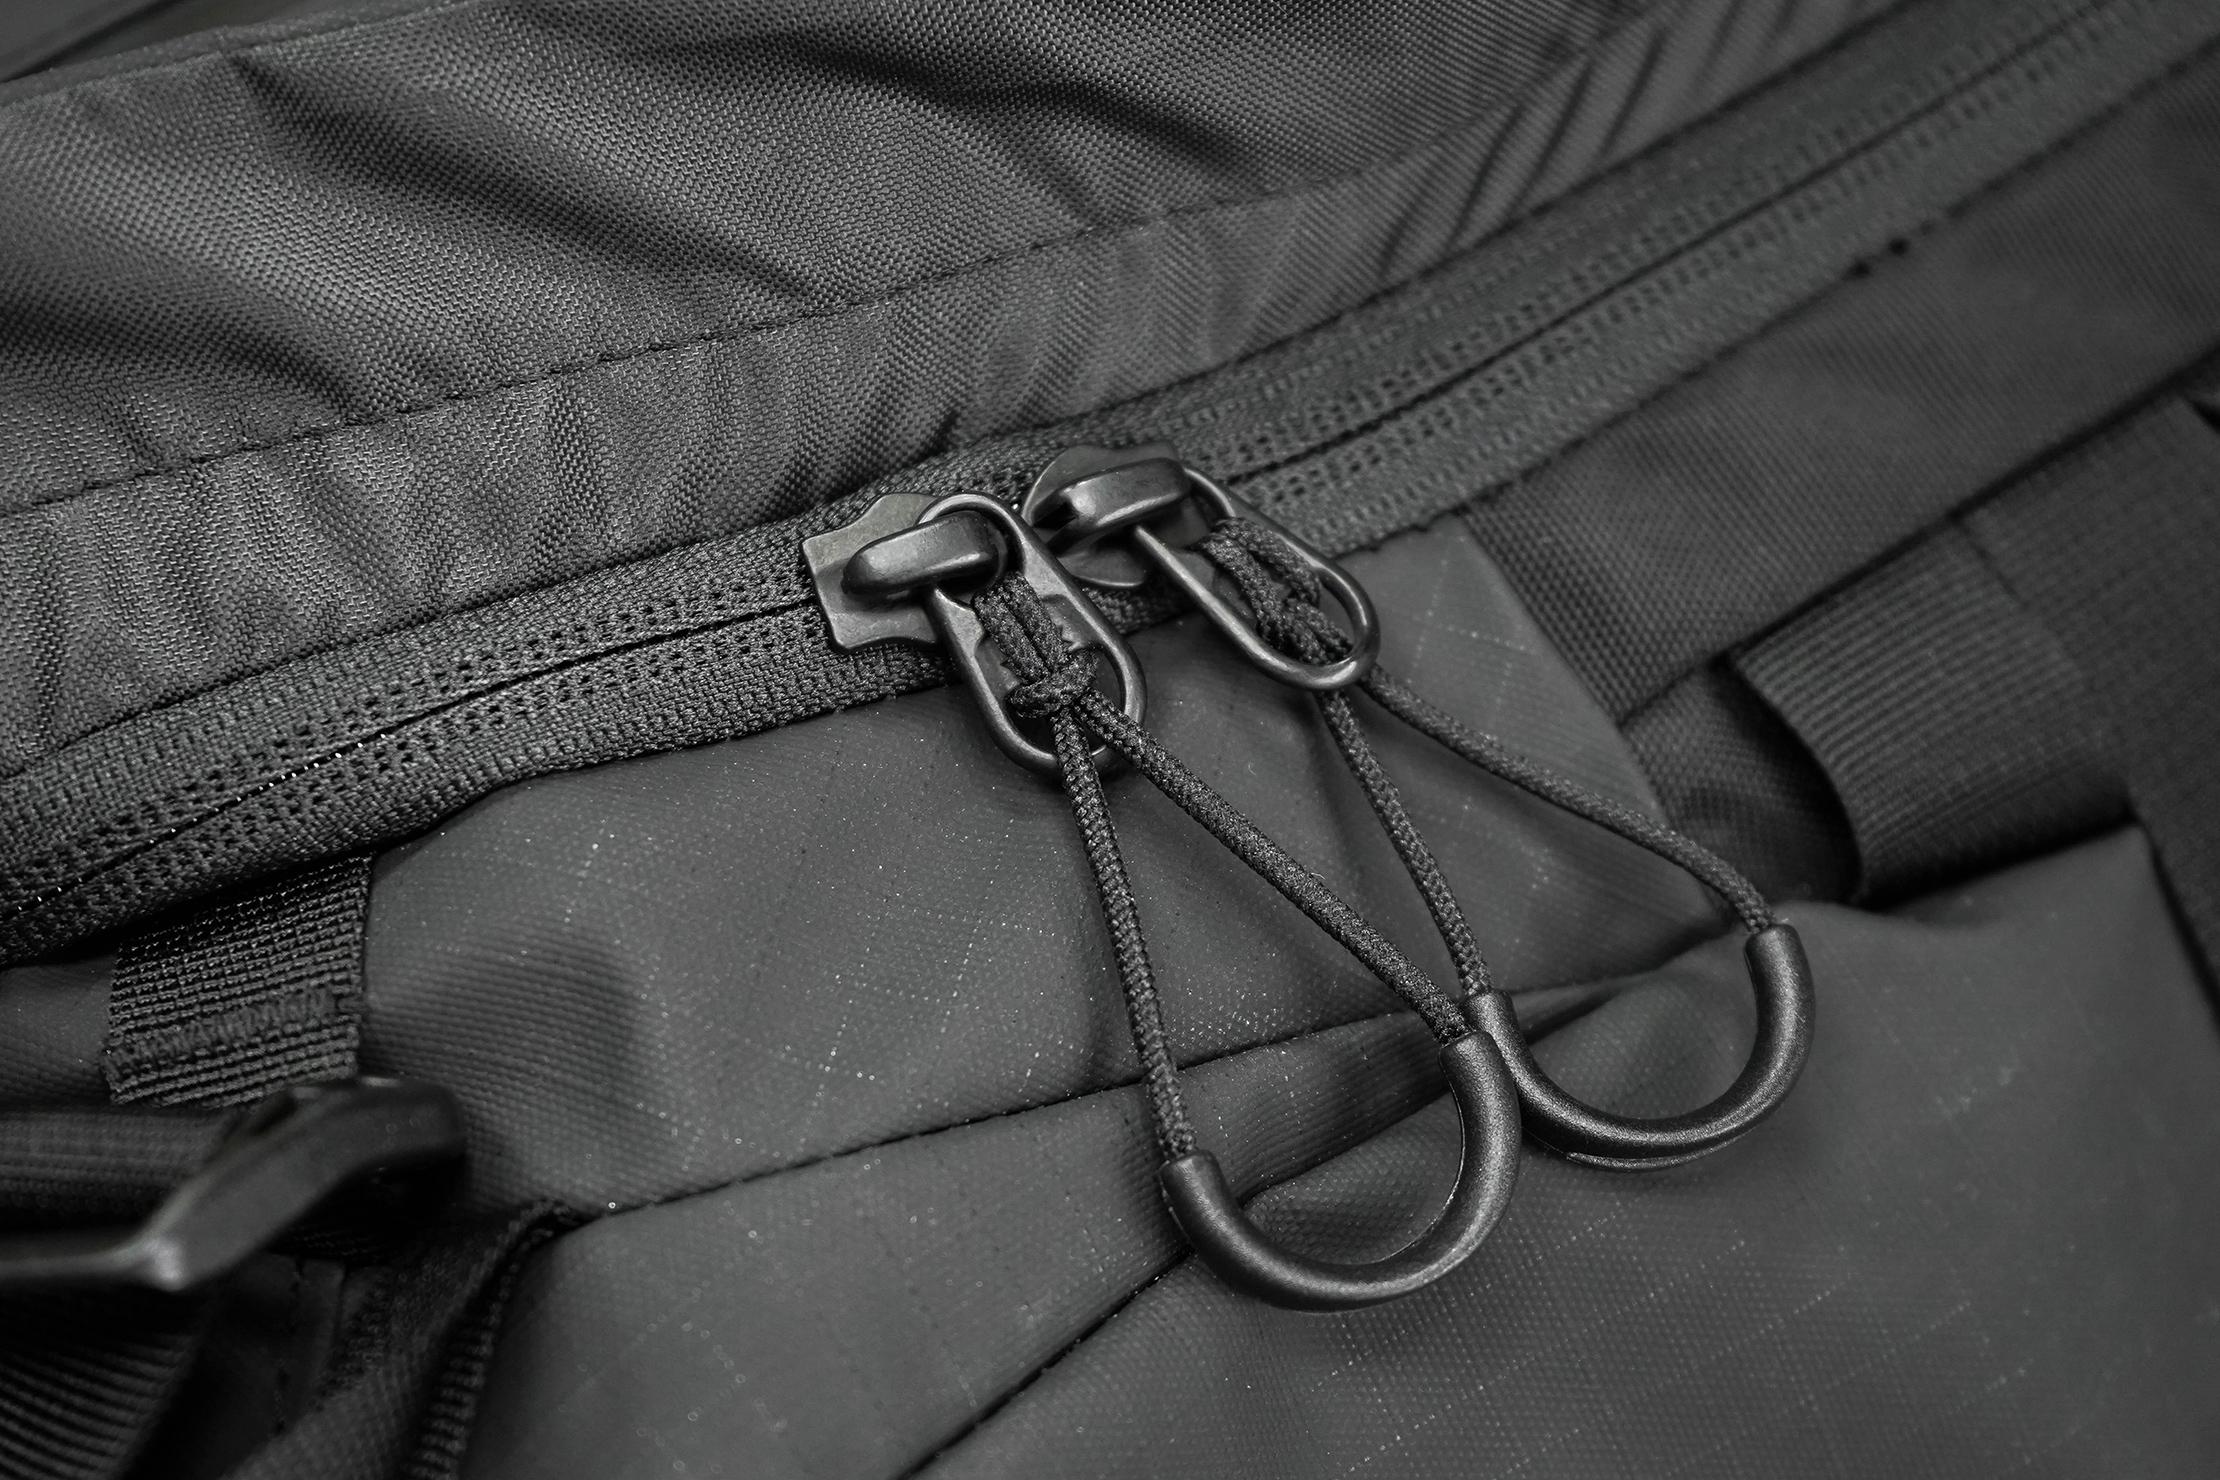 WANDRD Fernweh Zippers